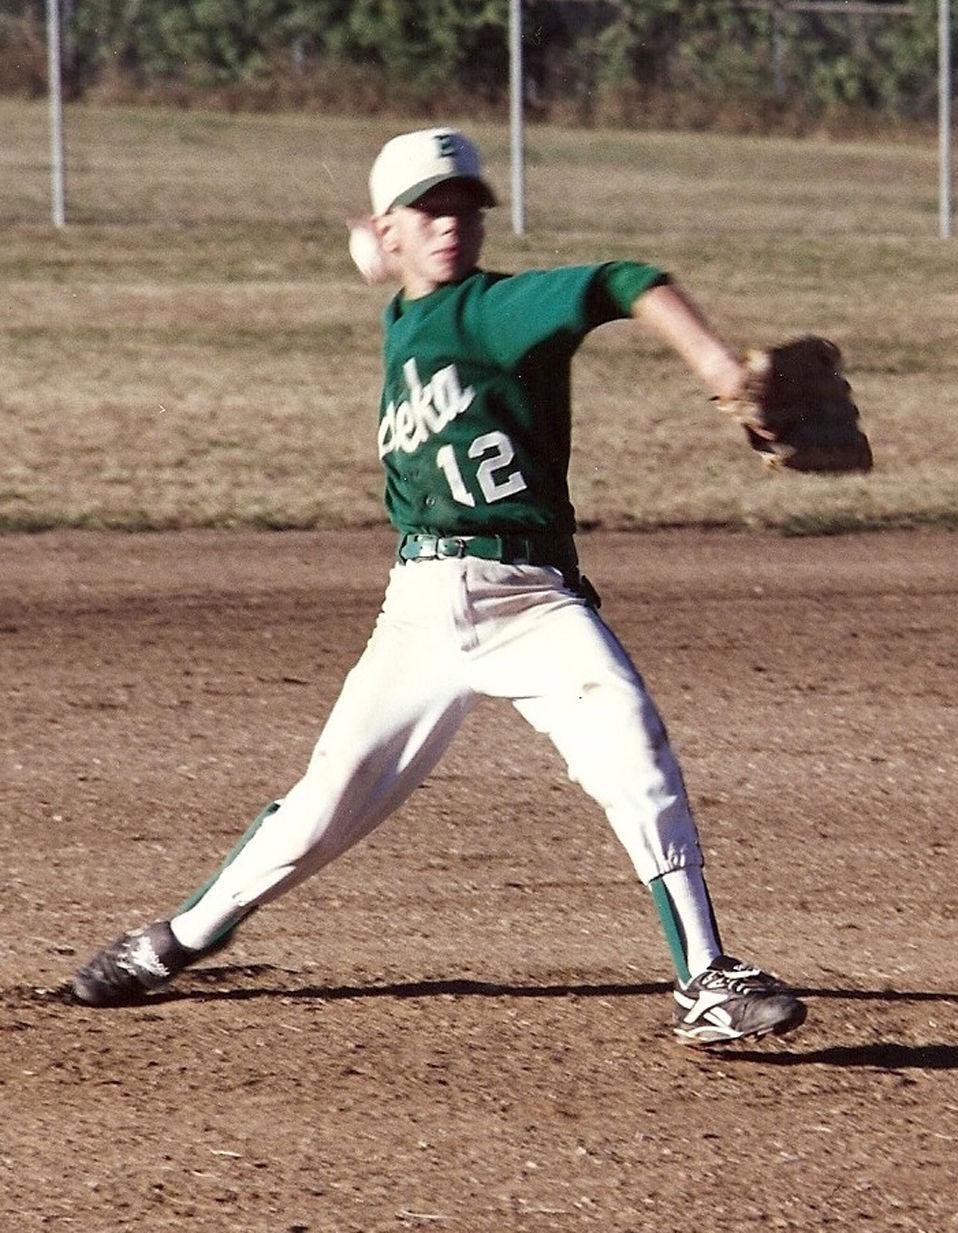 Photos: The baseball career of Ben Zobrist | Photo Galleries ...